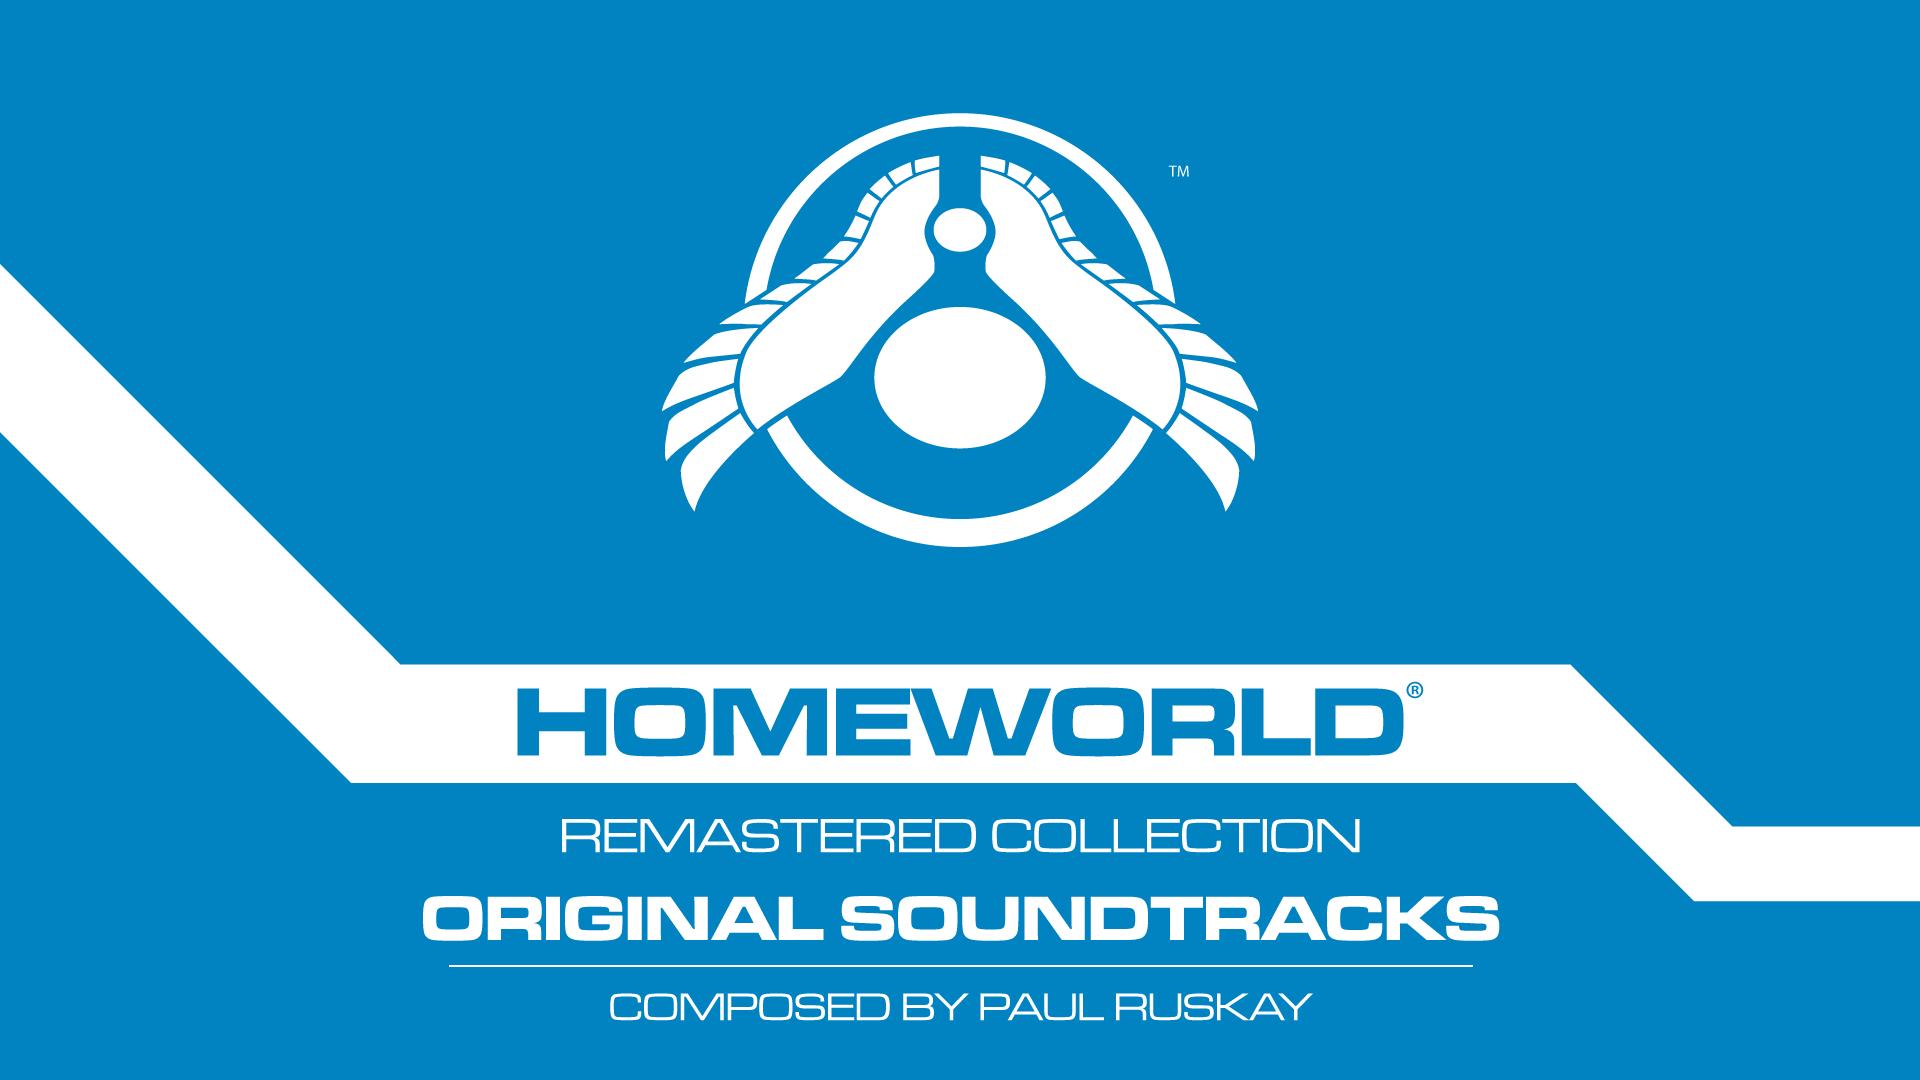 Homeworld Remastered Soundtracks - Paul Ruskay